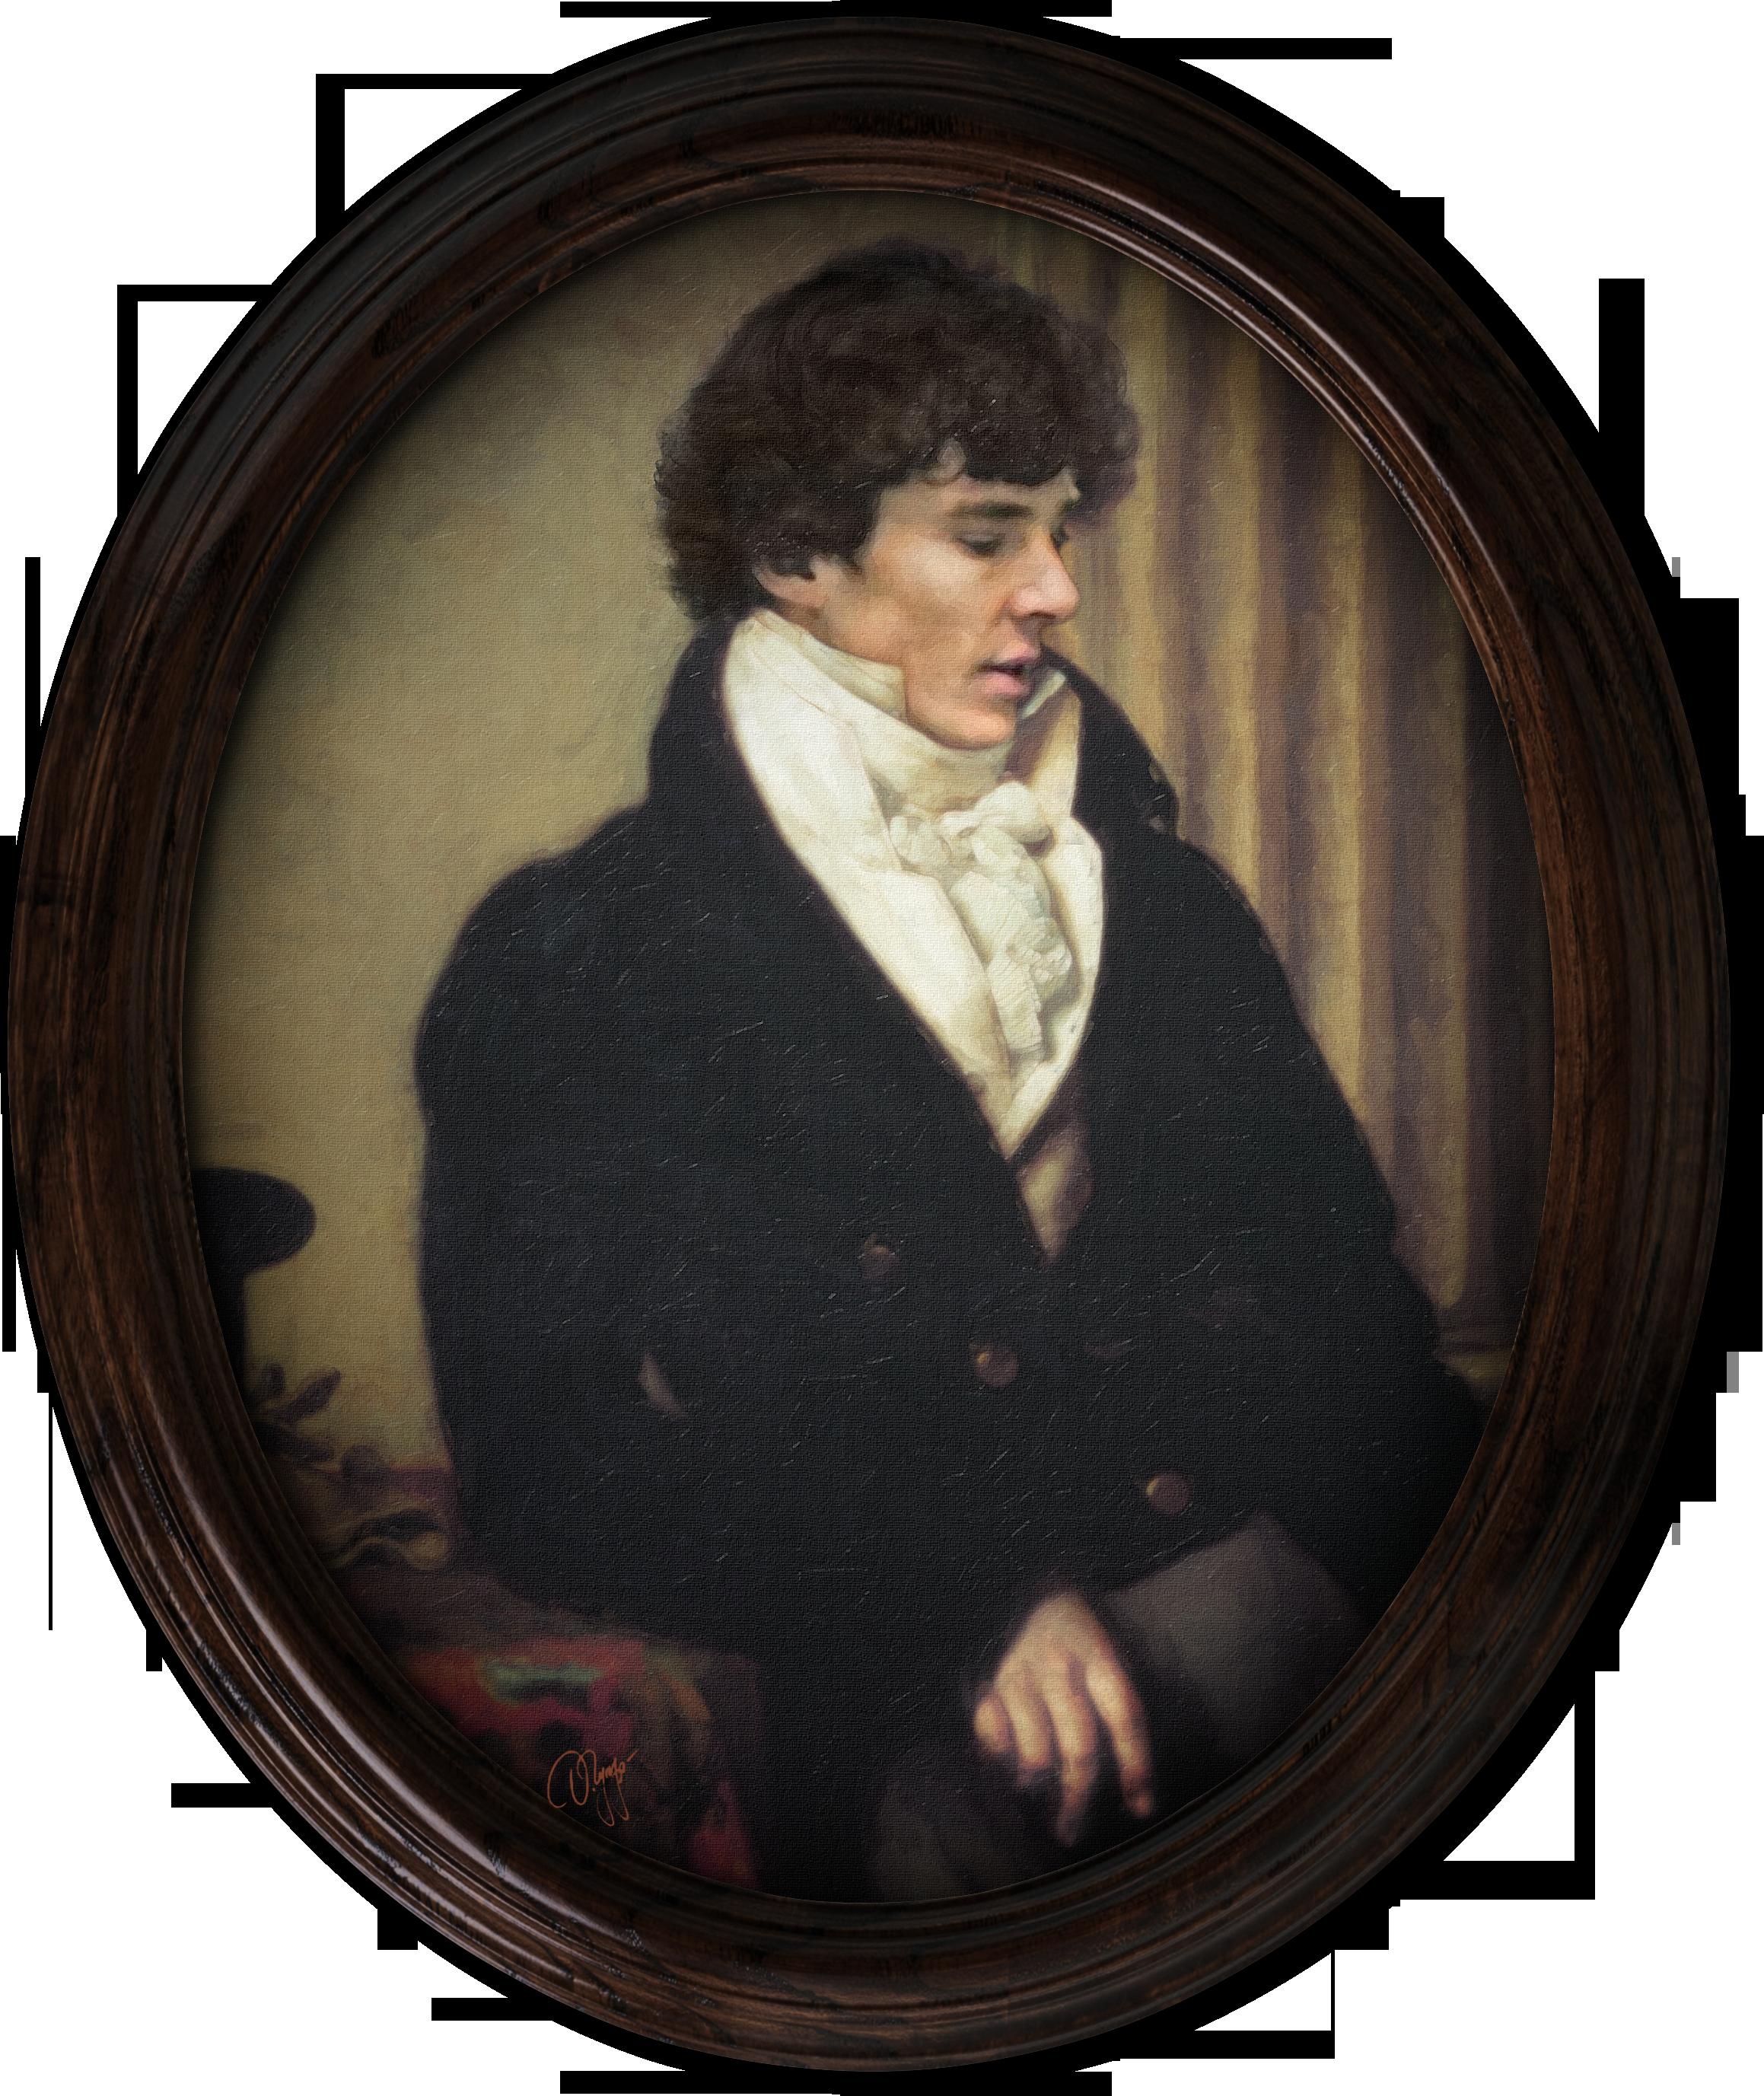 All times Sherlock: Epoch of romanticism by gemmiona